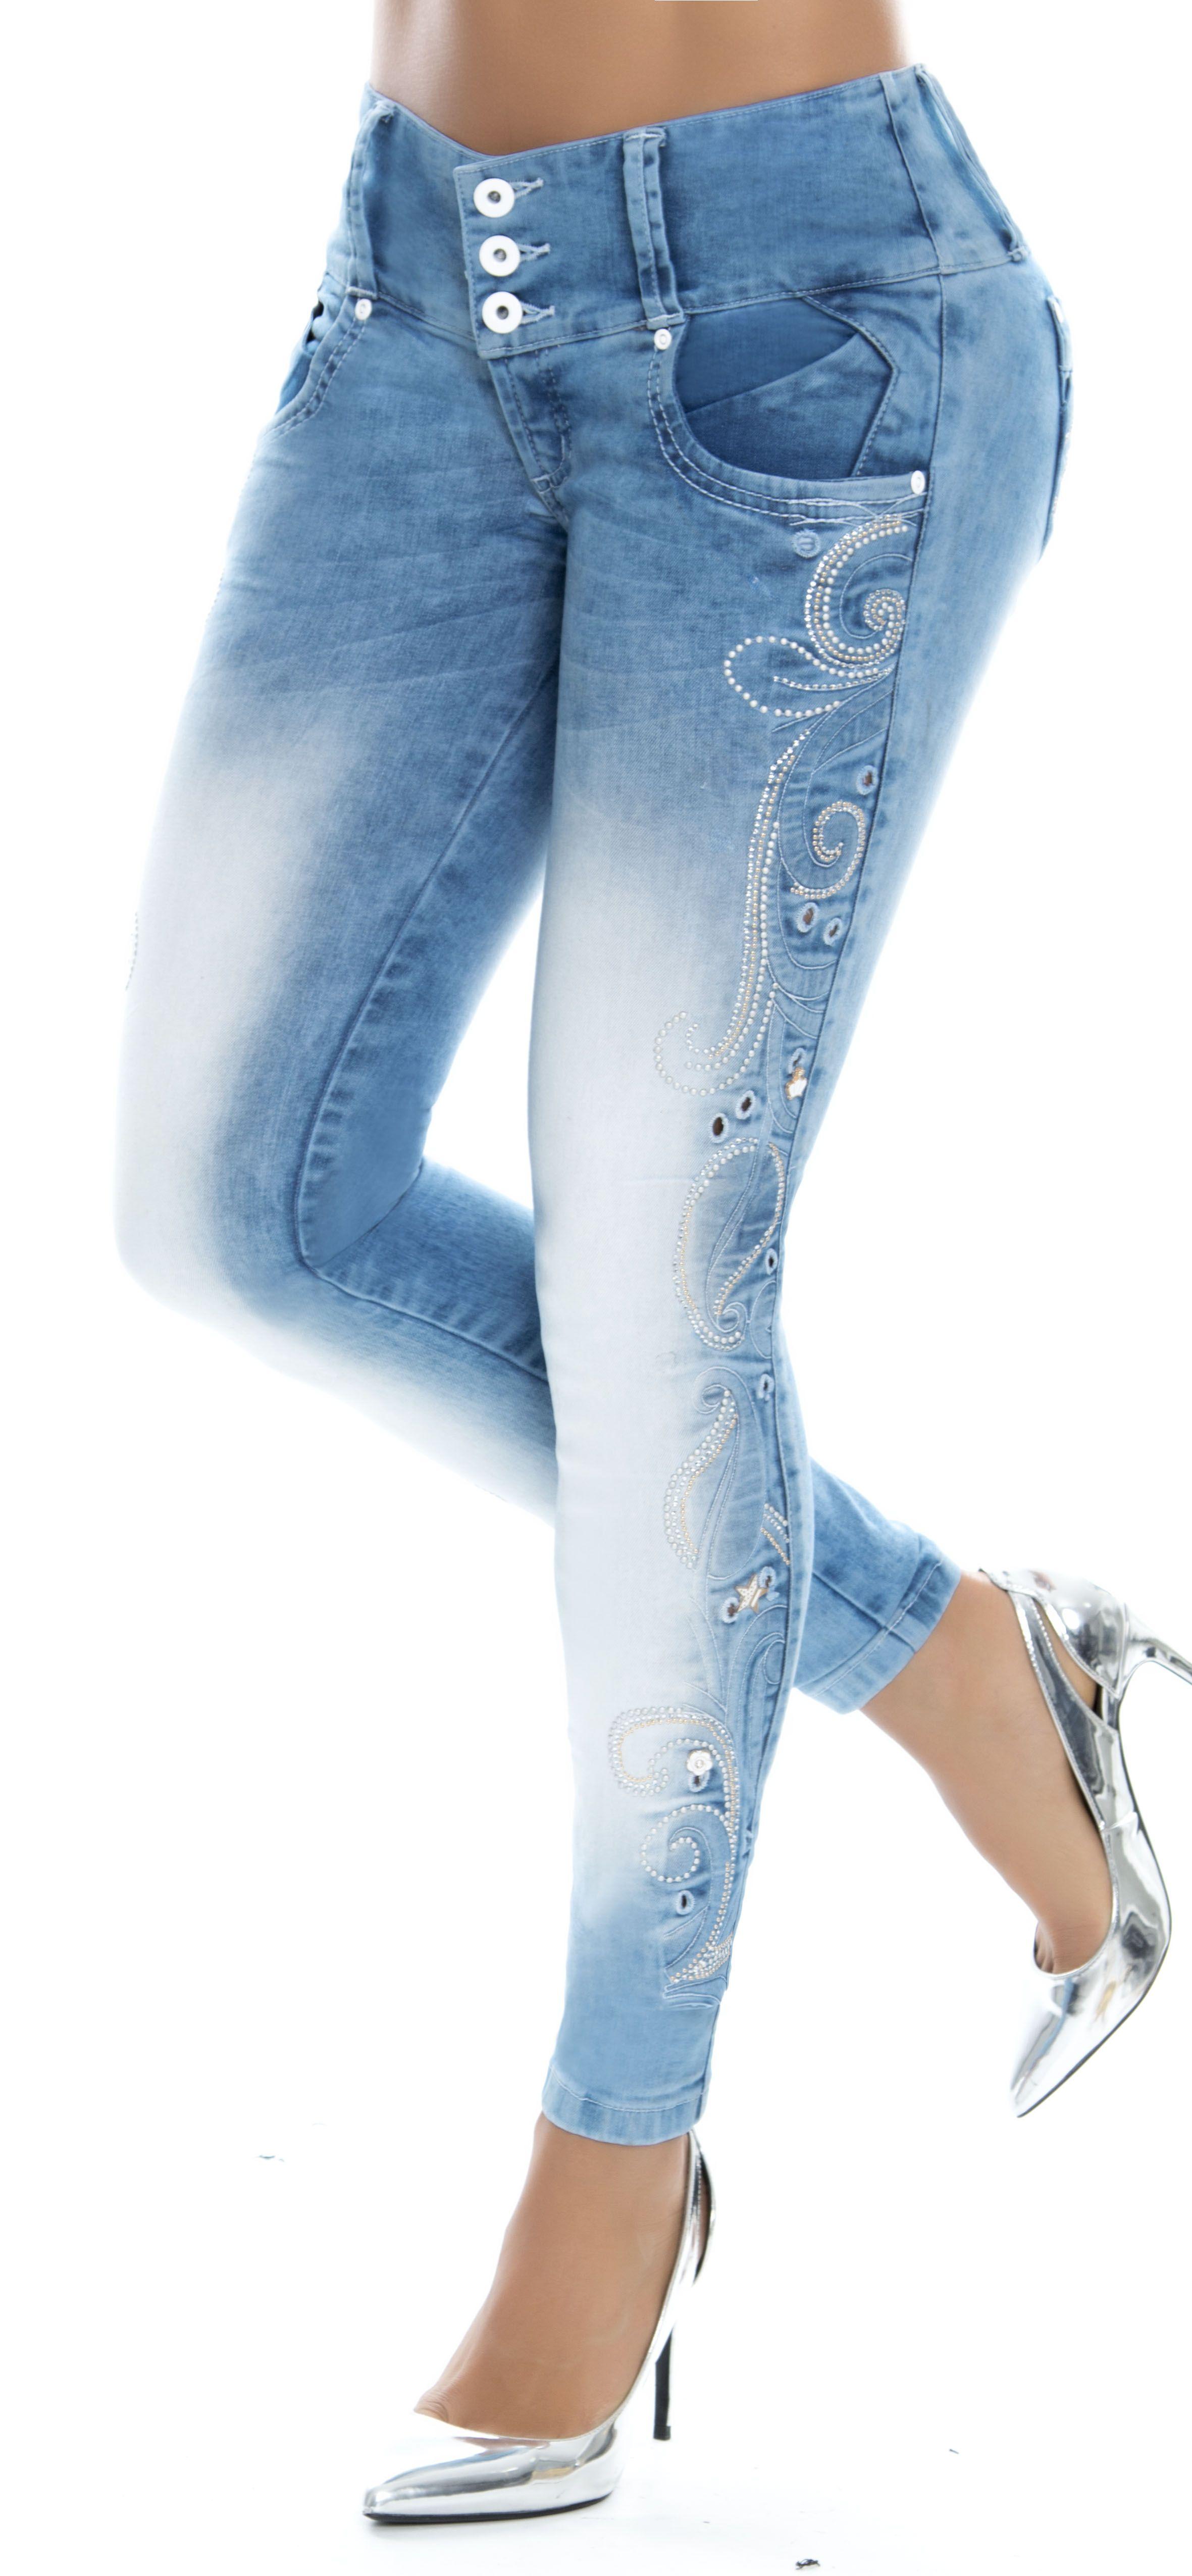 Jeans Levanta Cola De Tiro Medio Azul Claro Ref 86214 Marca Wow Silueta Ajustada Con Efecto Push U Jeans De Moda Pantalones De Moda Pantalones Vaqueros Claros